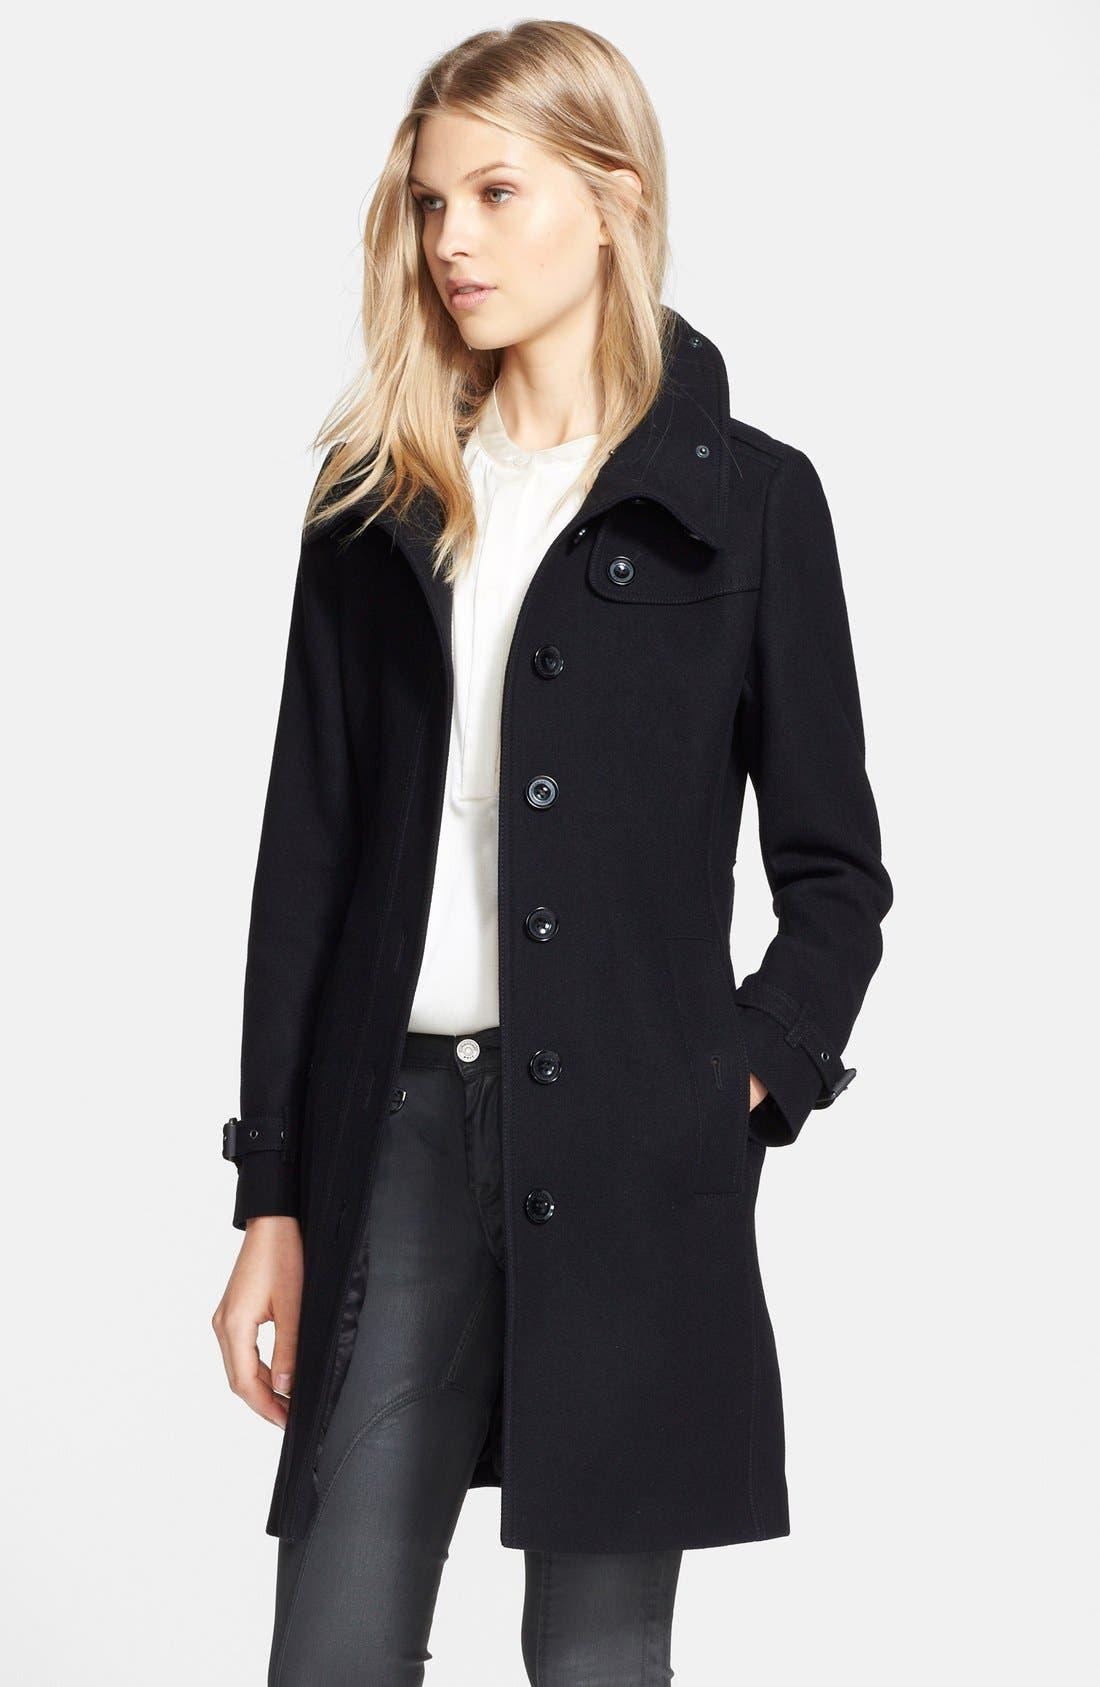 'Rushfield' Wool Blend Single Breasted Coat,                             Alternate thumbnail 3, color,                             001